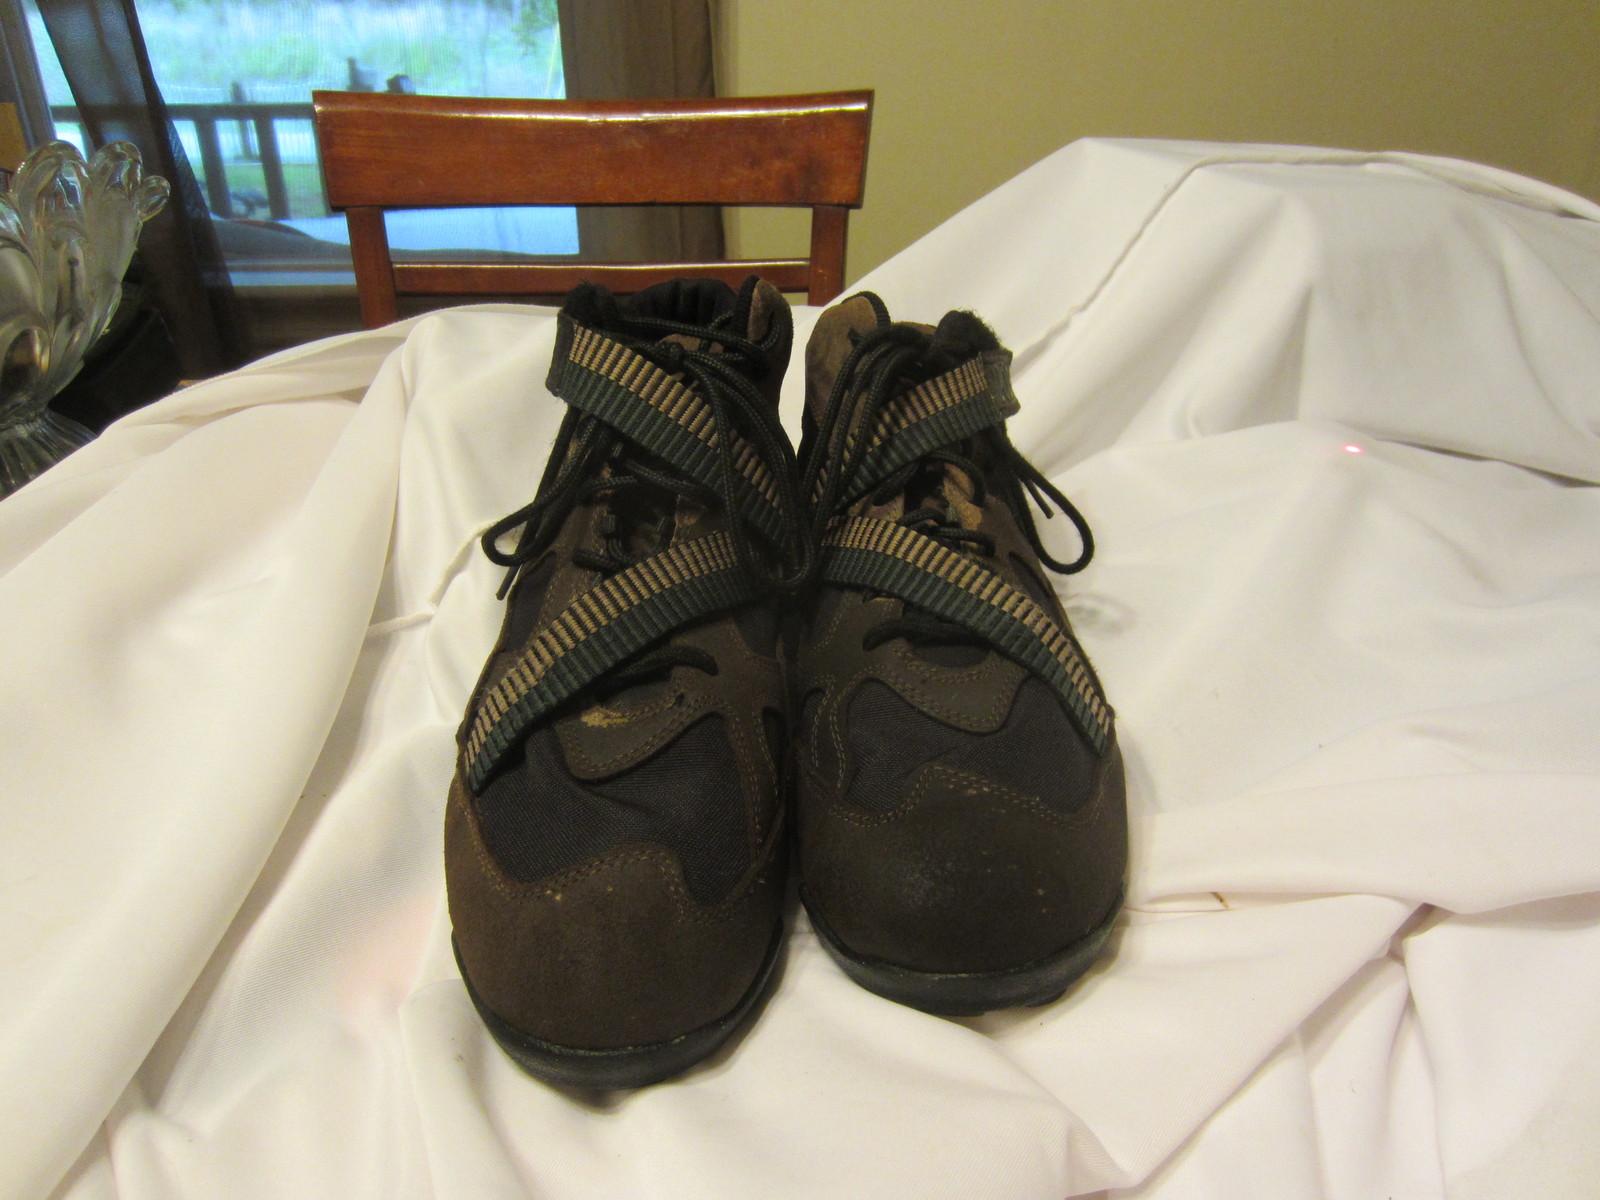 Giro de vuelta club voz  Nike ACG Poobah MTB Shoes Brown Size:15 and 10 similar items